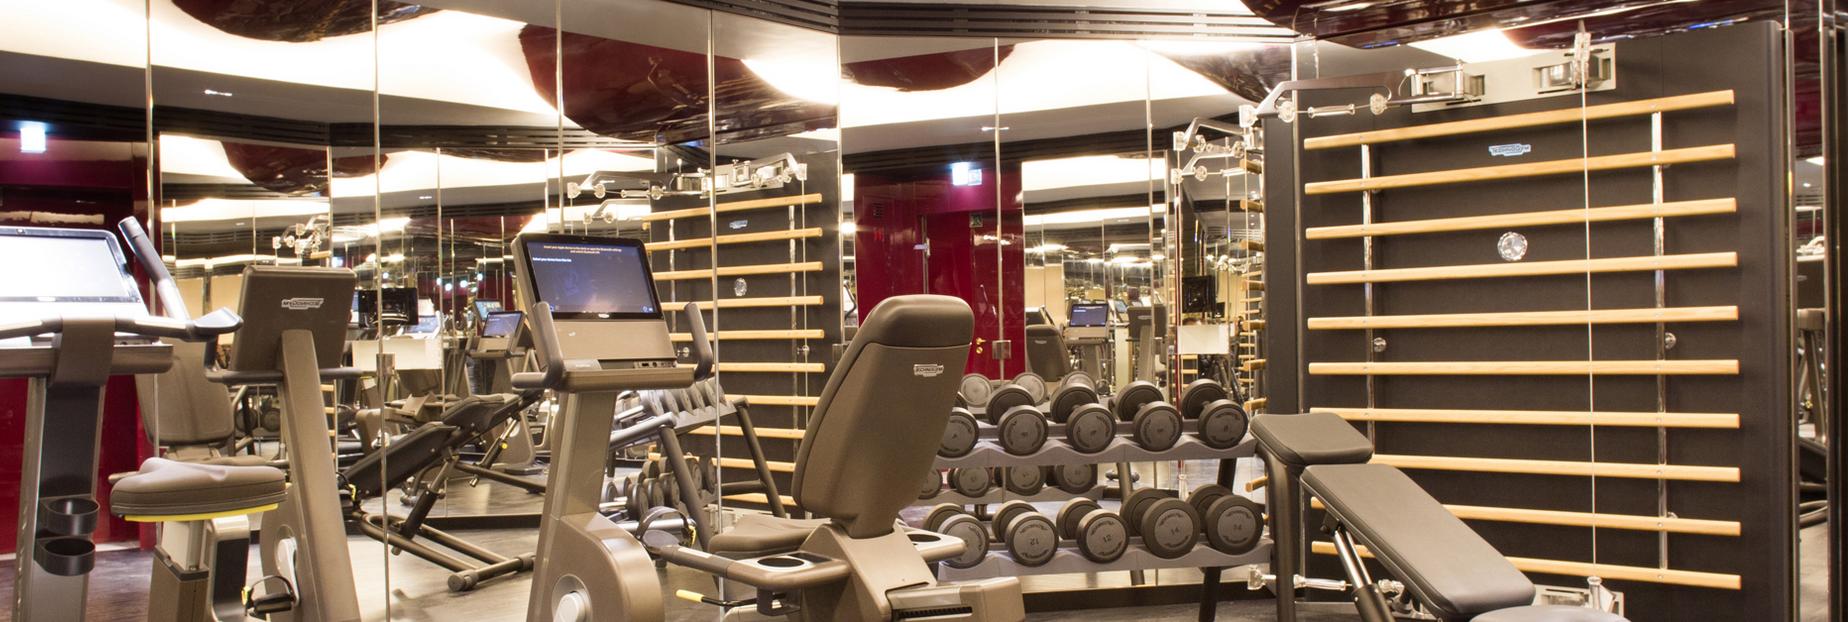 la_reserve_paris_hotel_gym_fancyoli